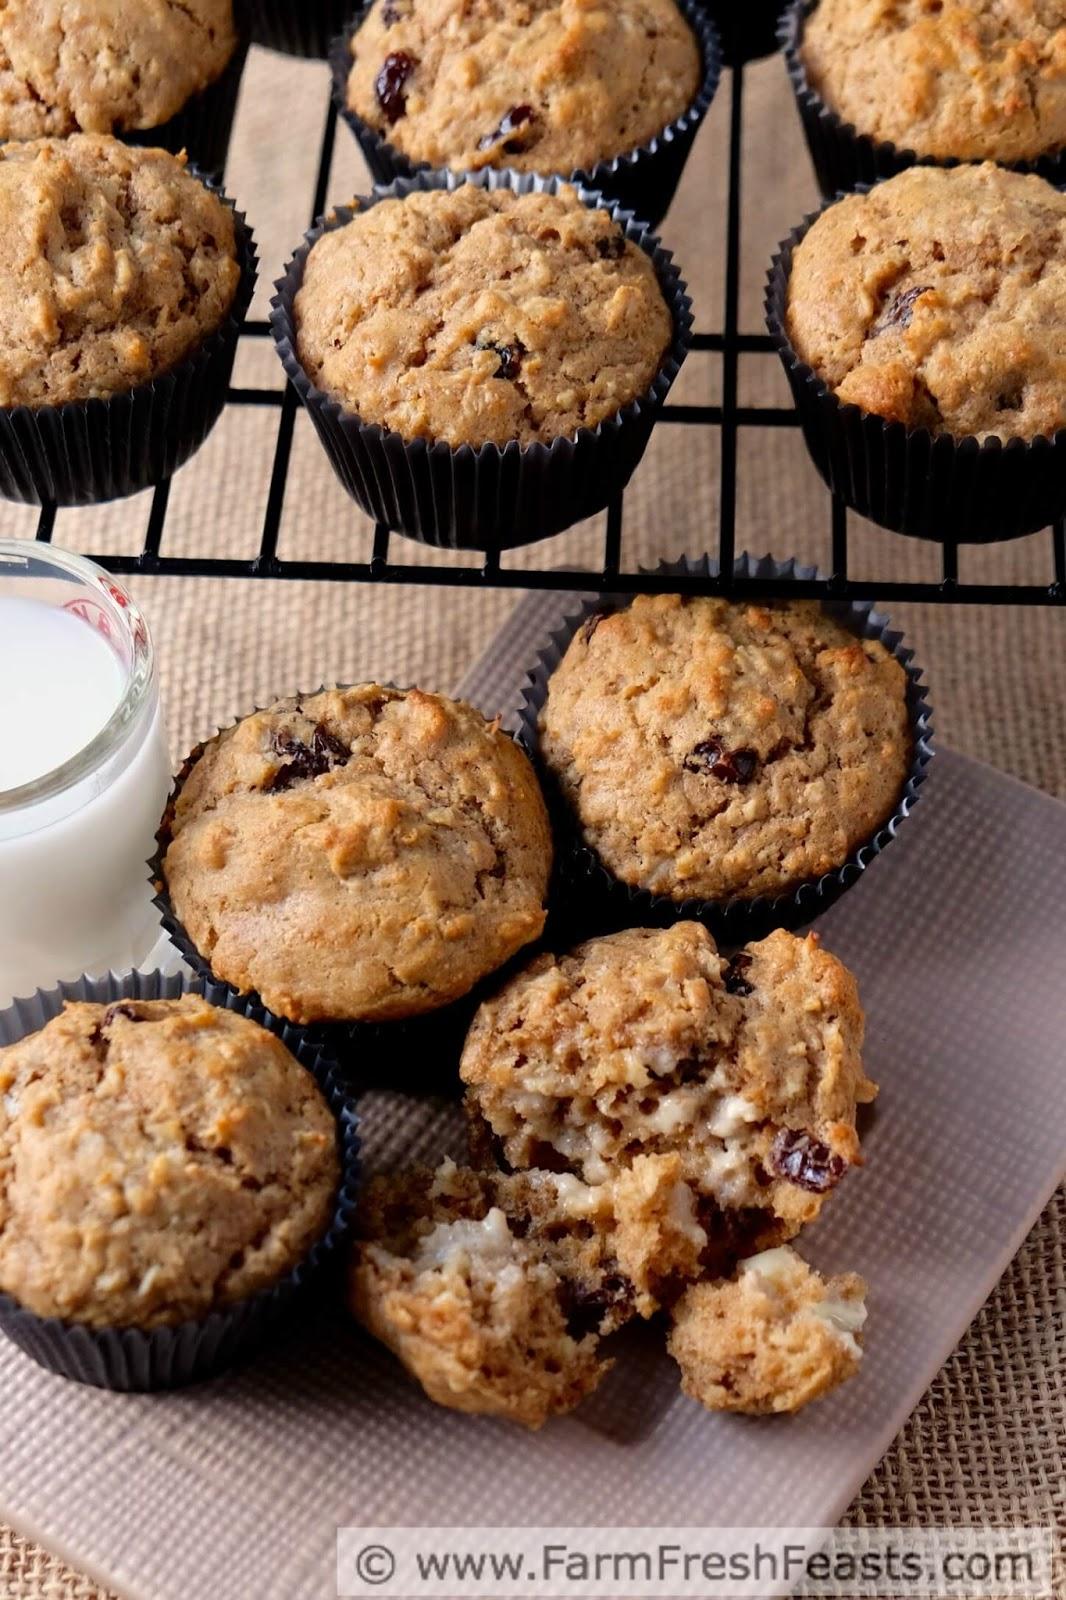 Farm Fresh Feasts: Oatmeal Raisin Cookie Butter Muffins # ...